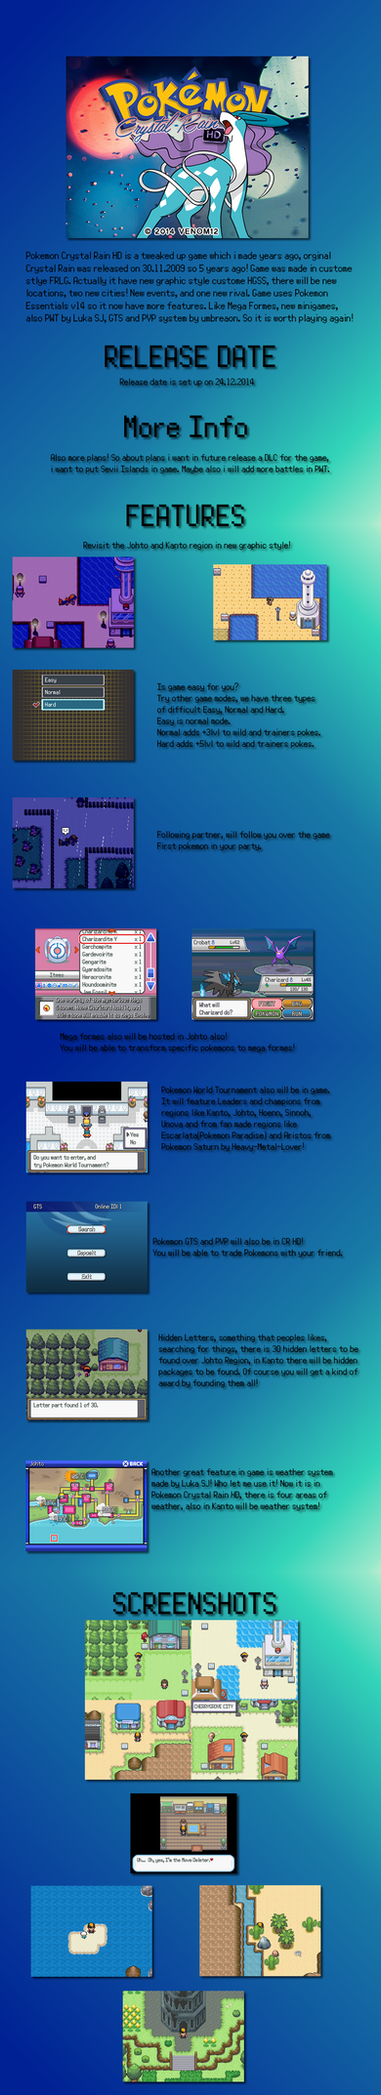 Pokemon Crystal Rain HD Presentation by Venom12314